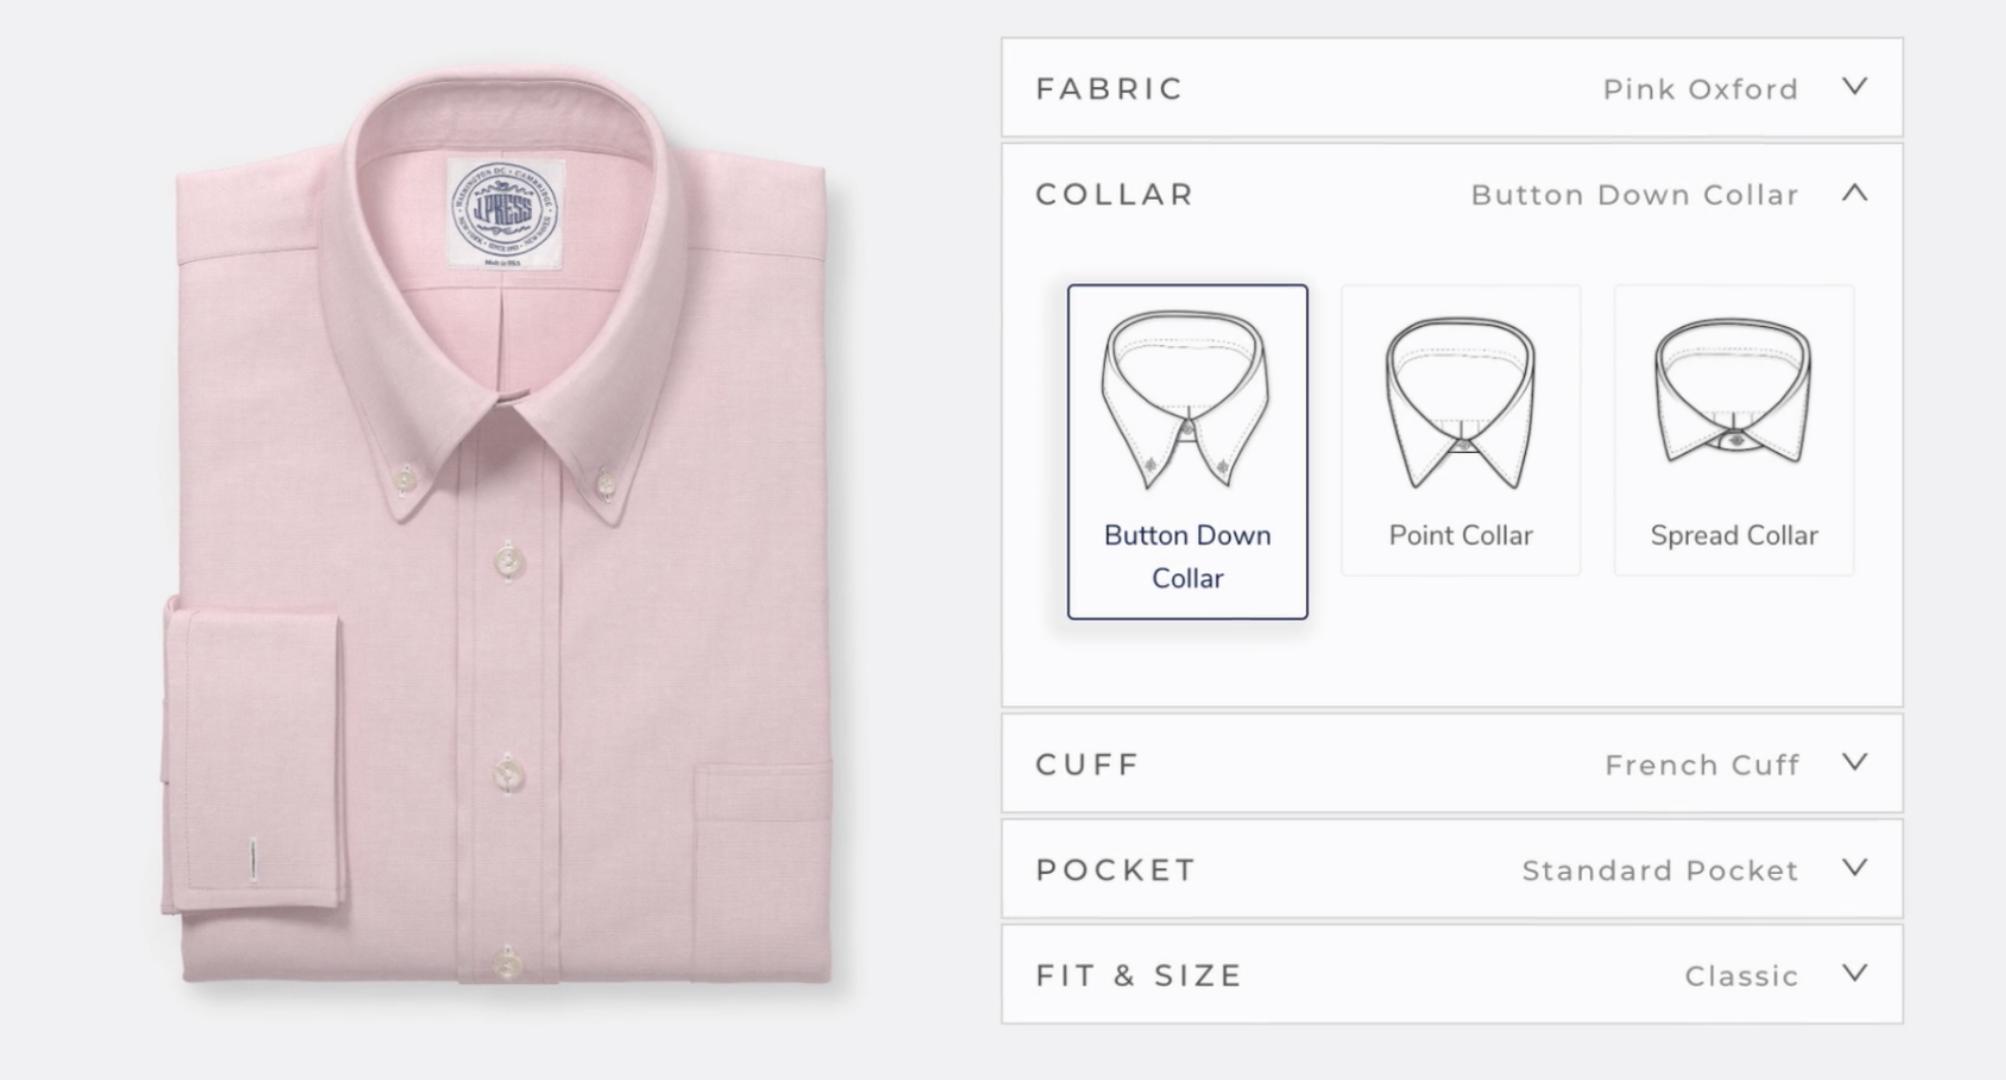 Using tech from product visualization platform Threekit, J. Press implemented dress shirt customization capabilities within its website.